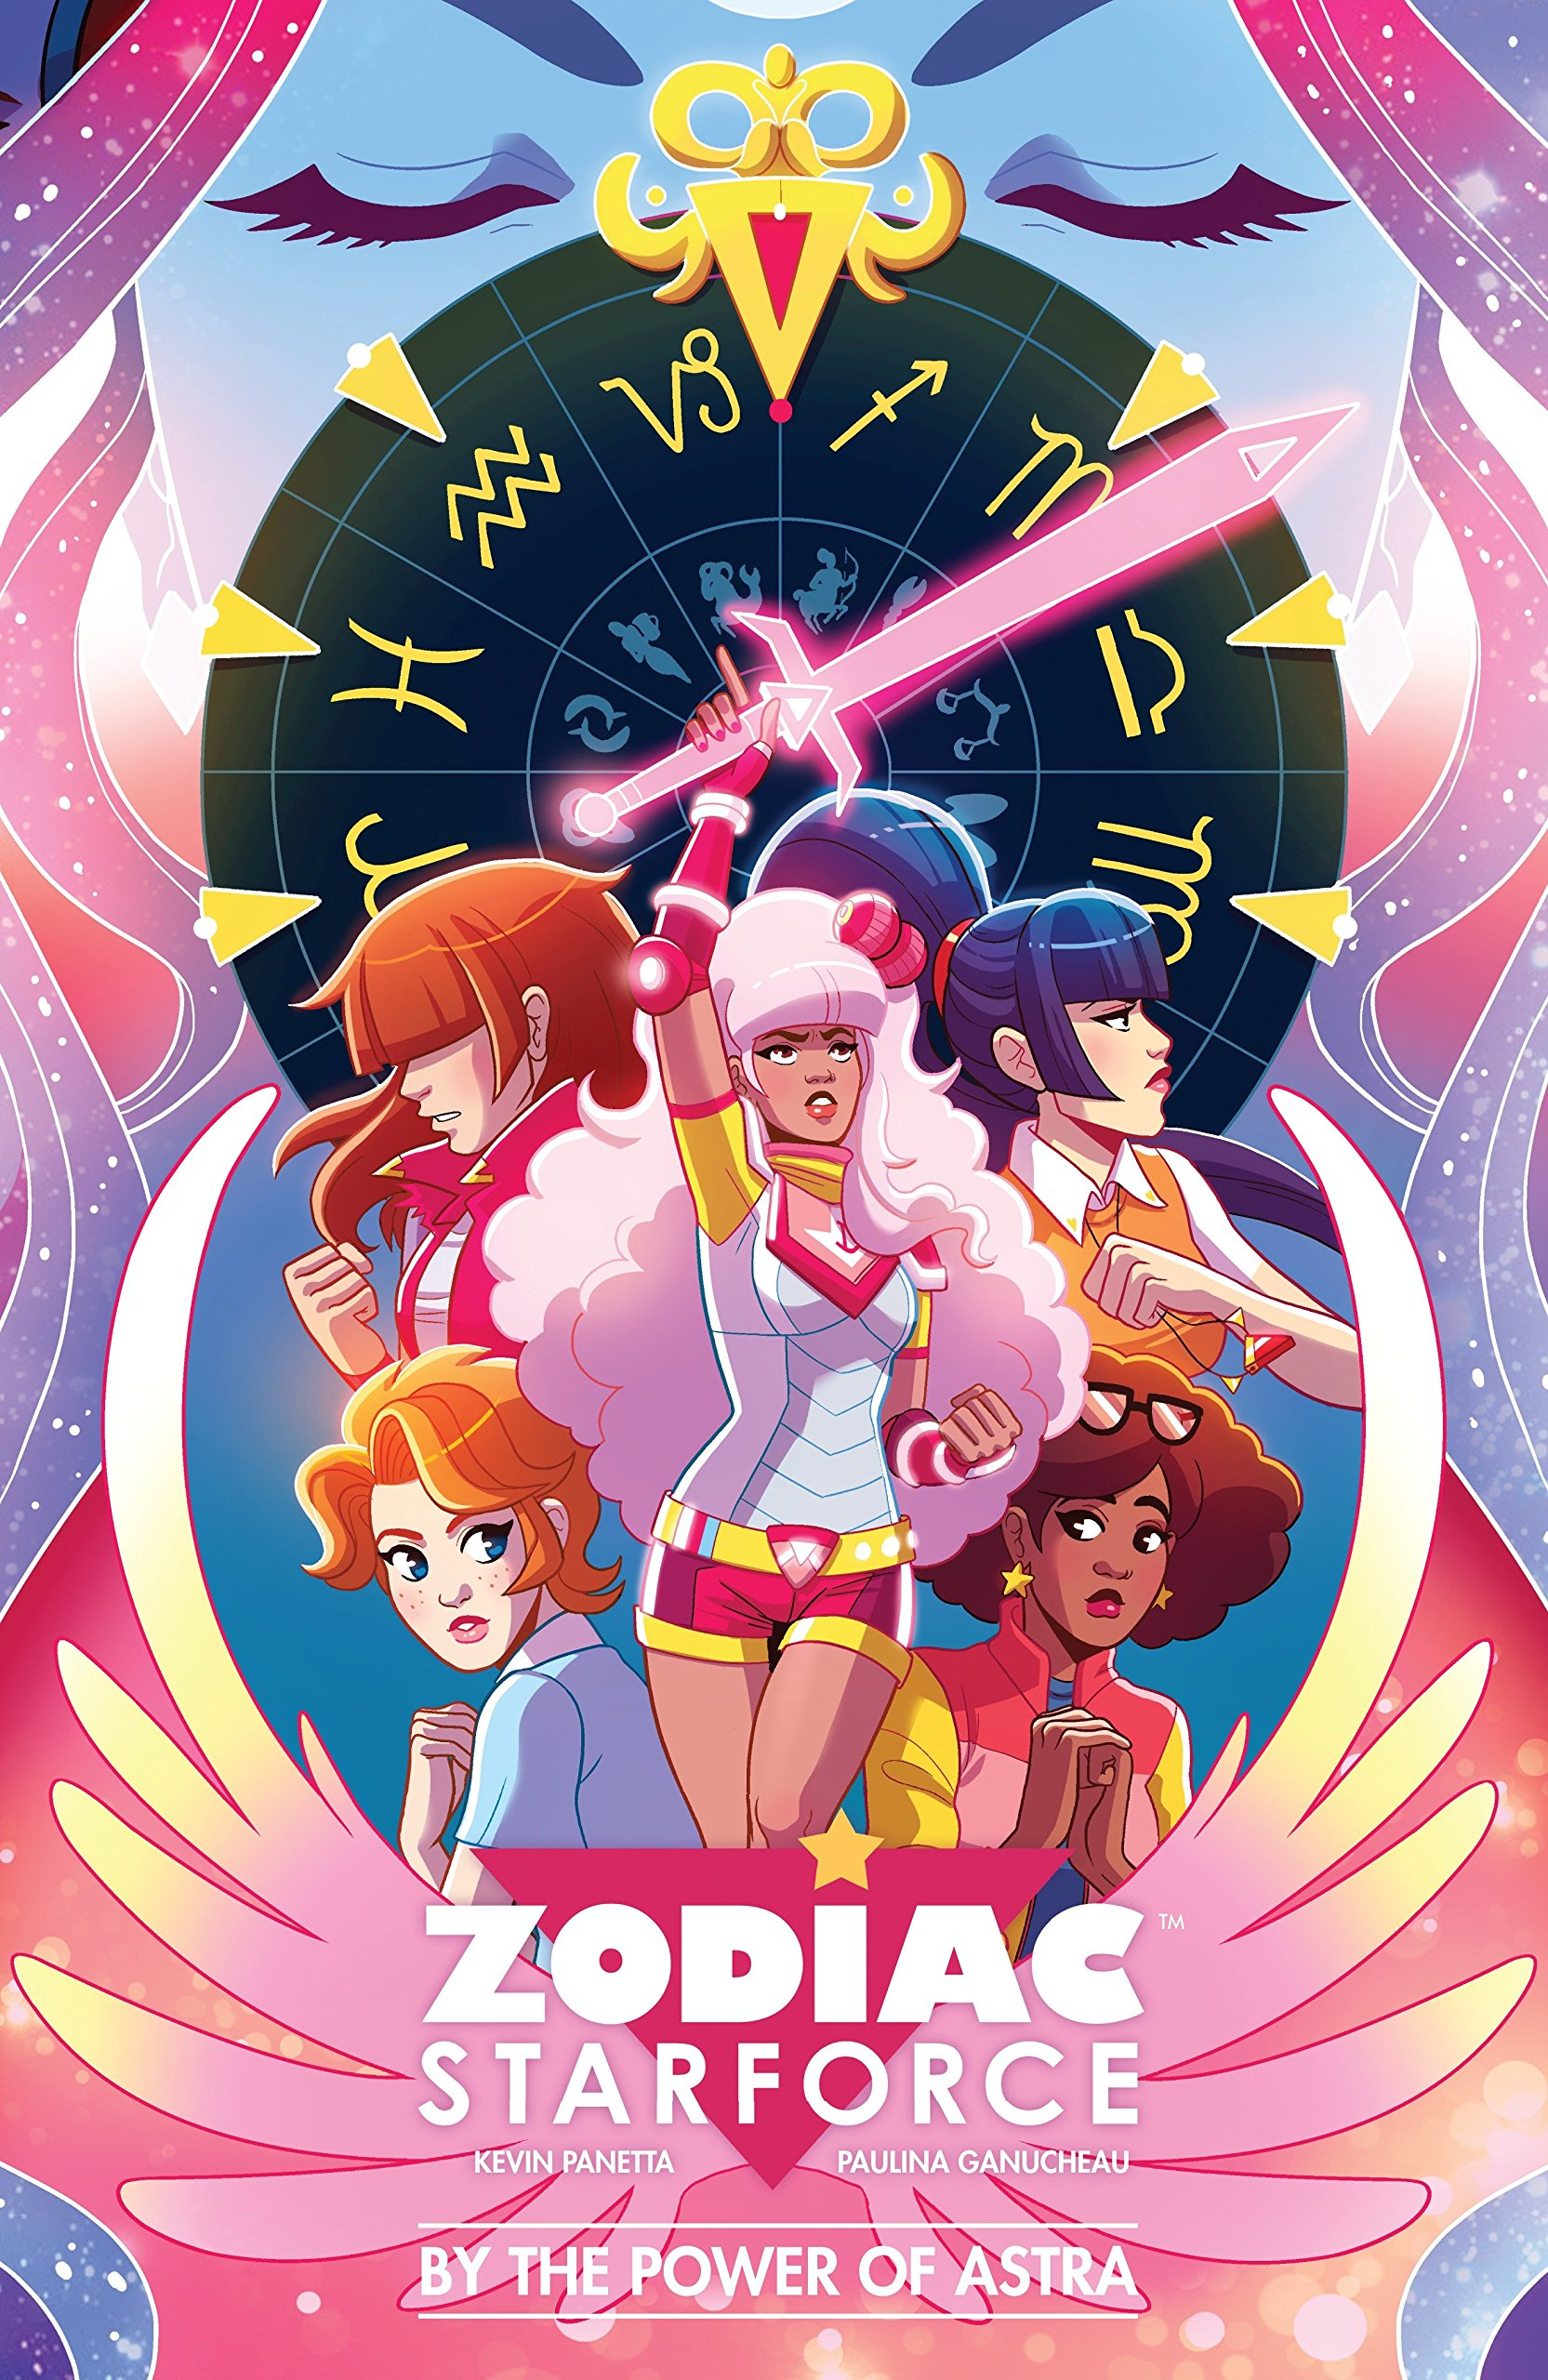 Zodiac Starfoce, deconstructive comics